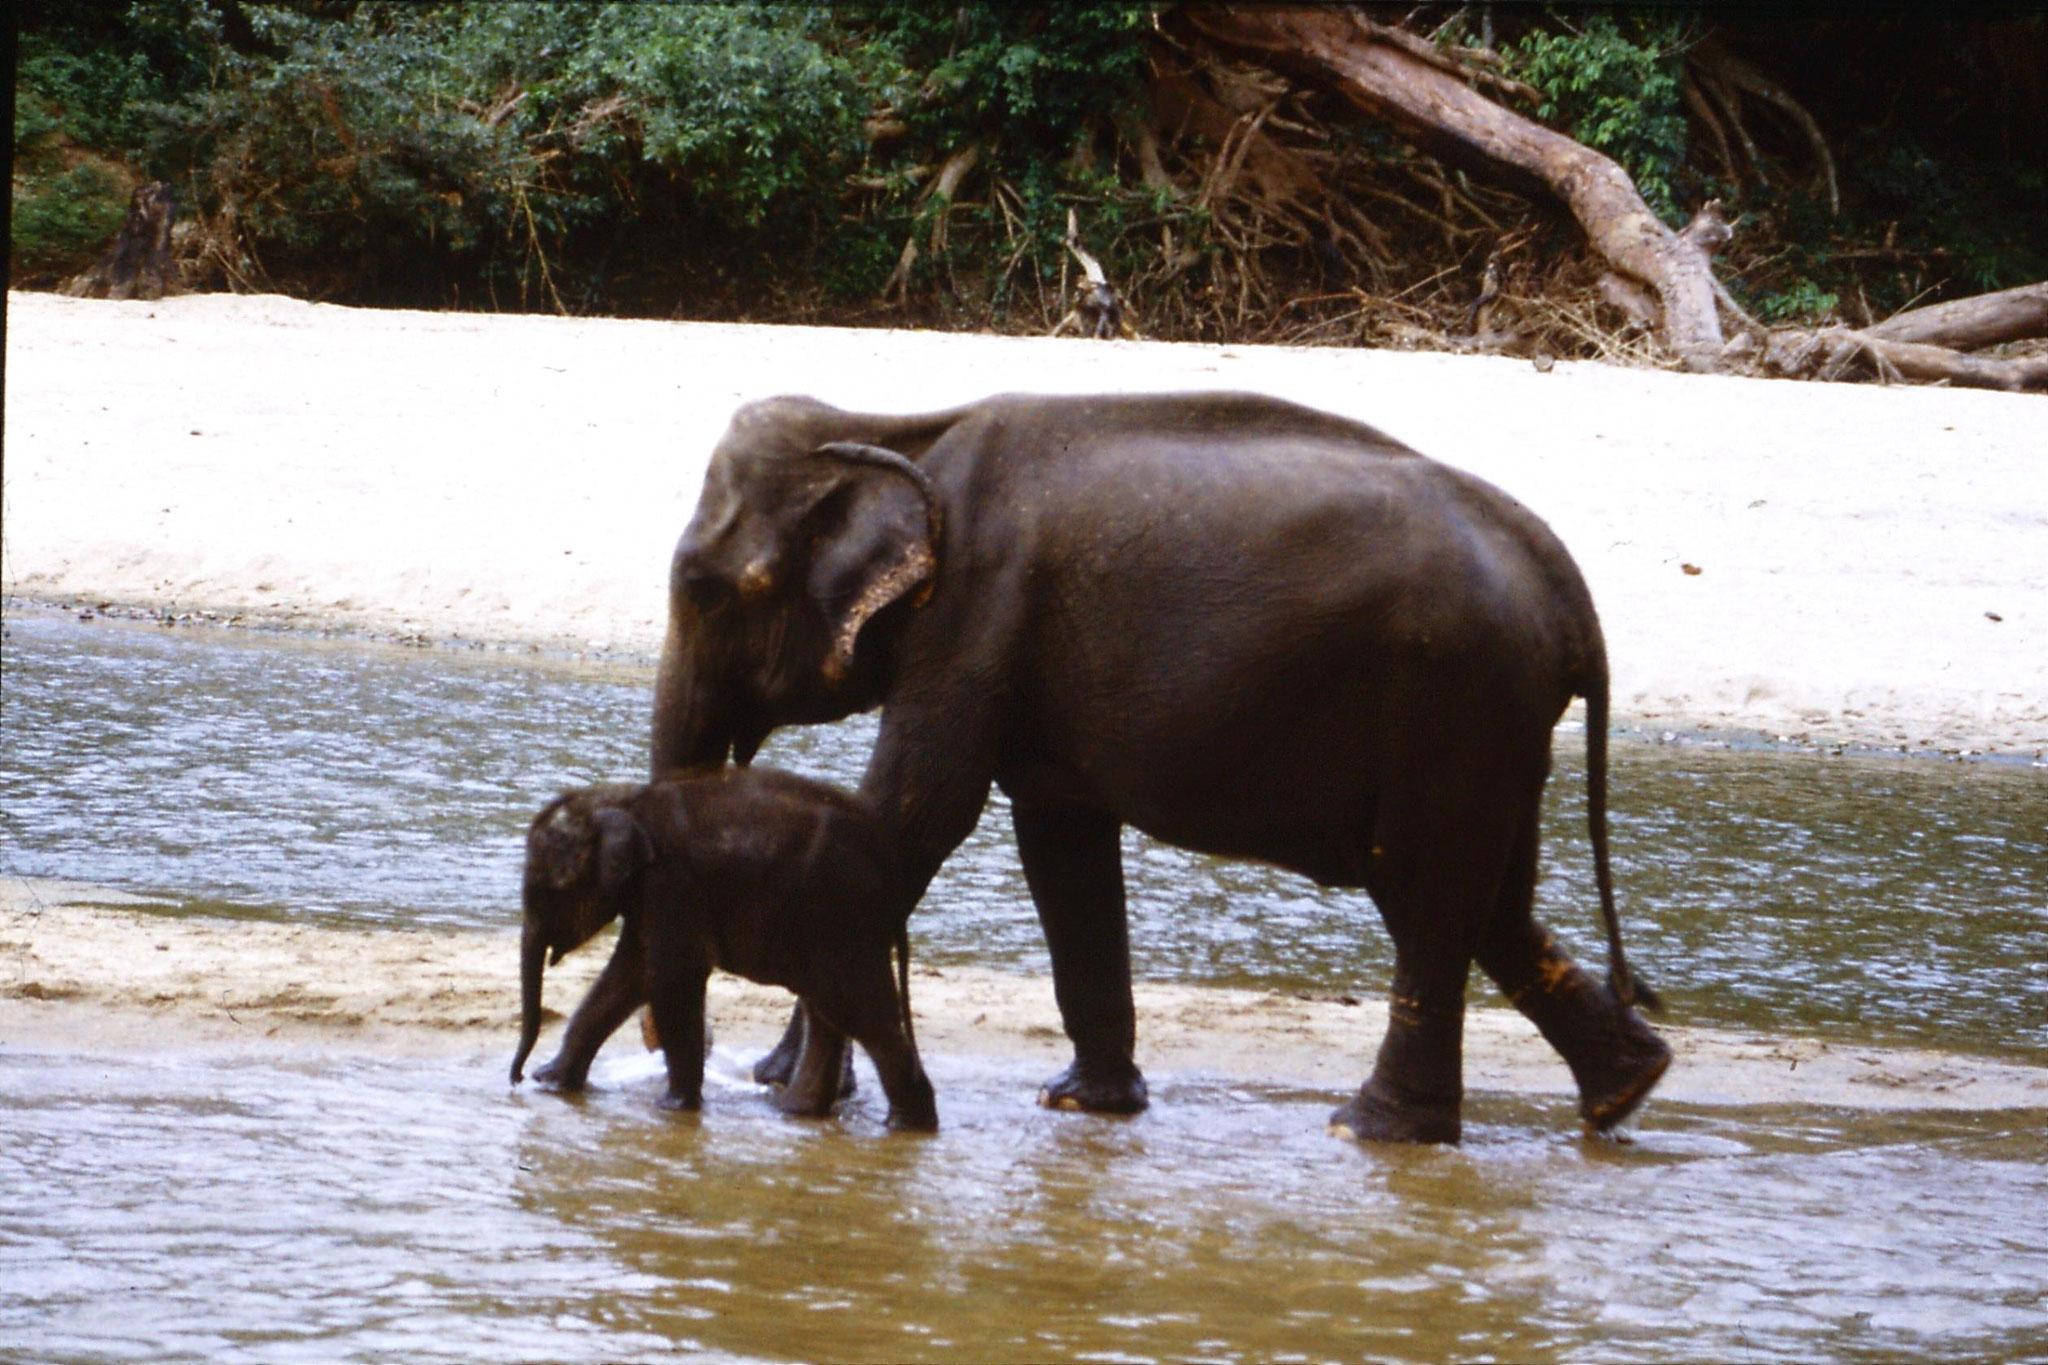 10/2/1990: 16: Kegalla elephant orphanage